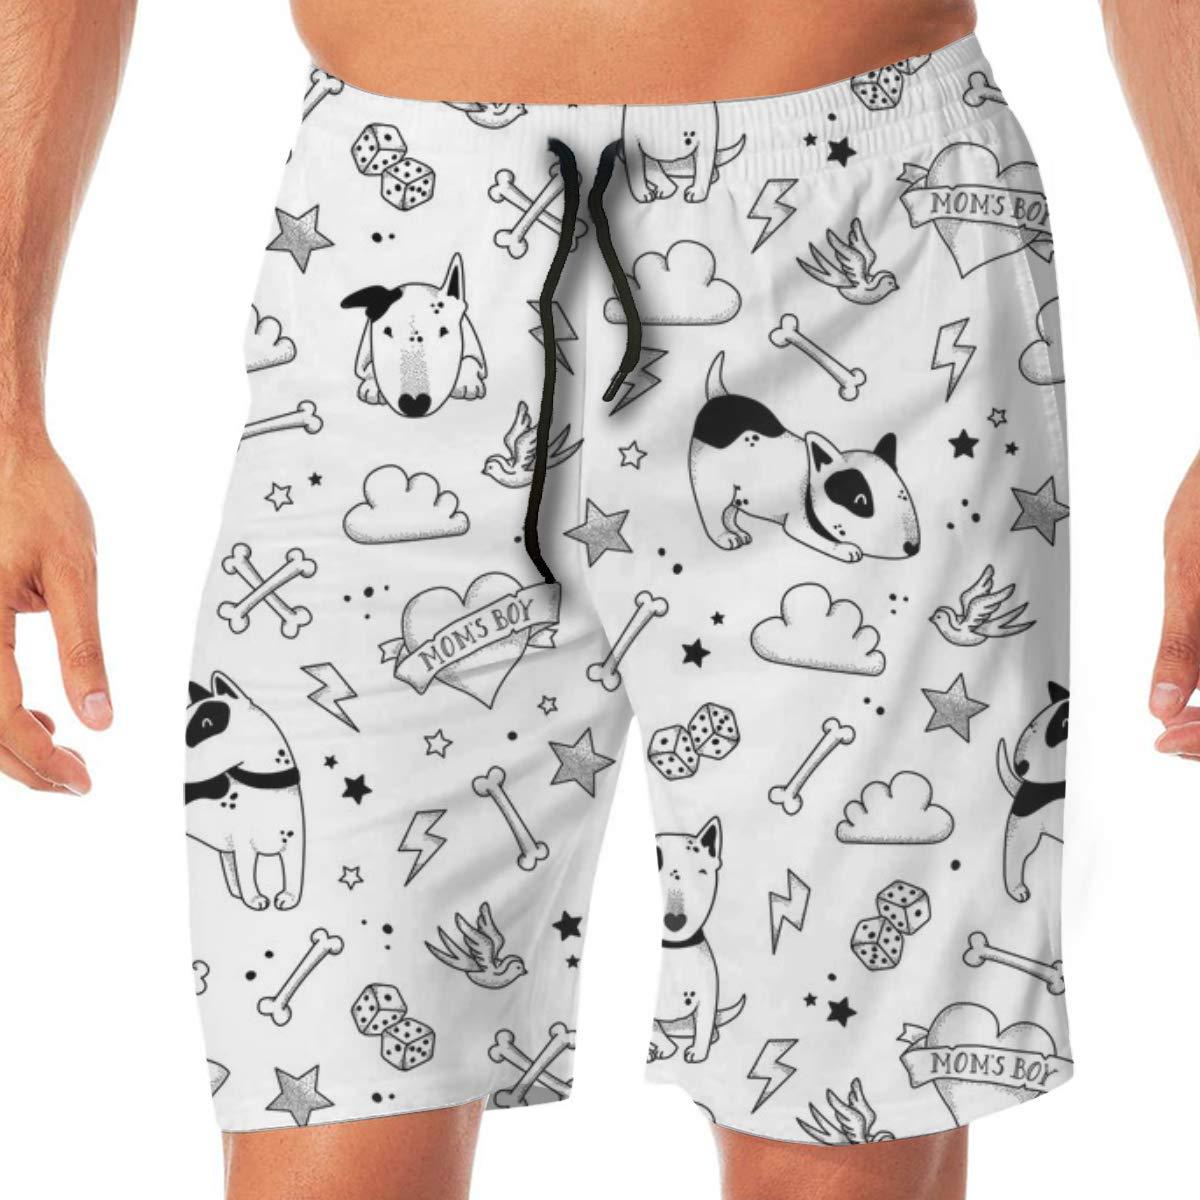 Bullterriers Tattoo Black Bullies Mens Beachwear Slim Fit Summer Holiday Swim Trunks Quick Dry Striped Swim Shorts